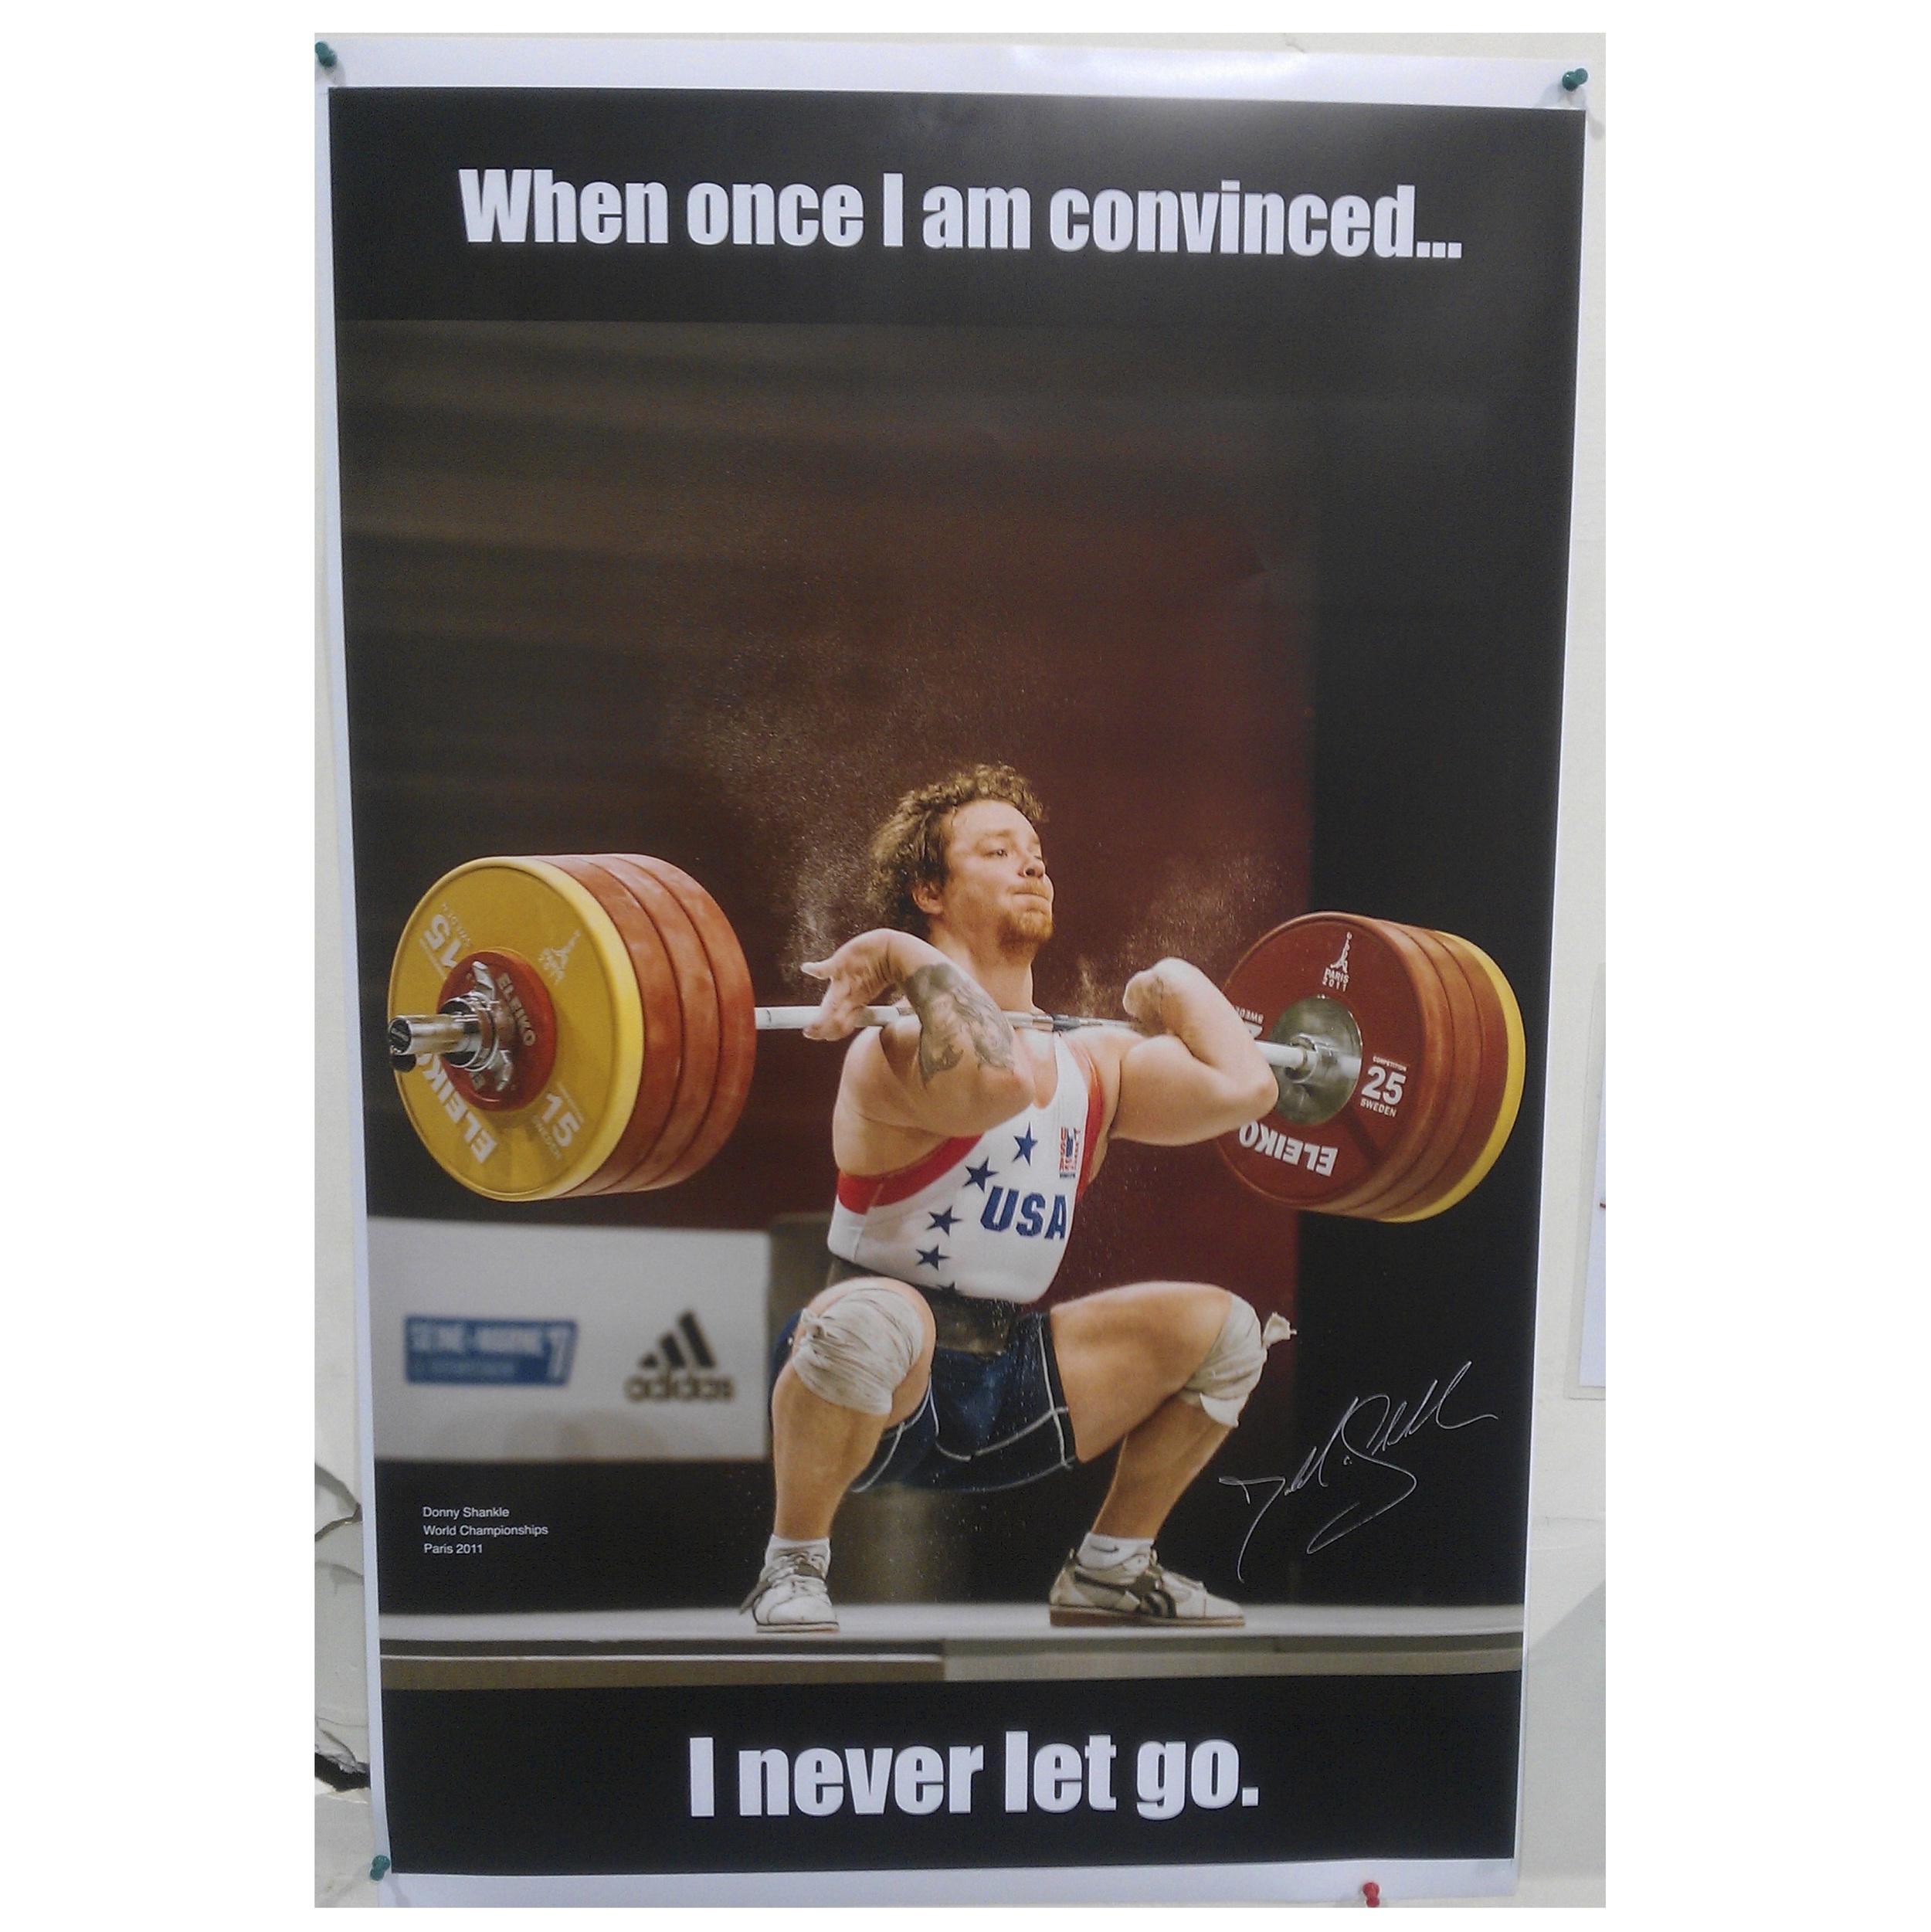 World Championships Poster 3'x2'